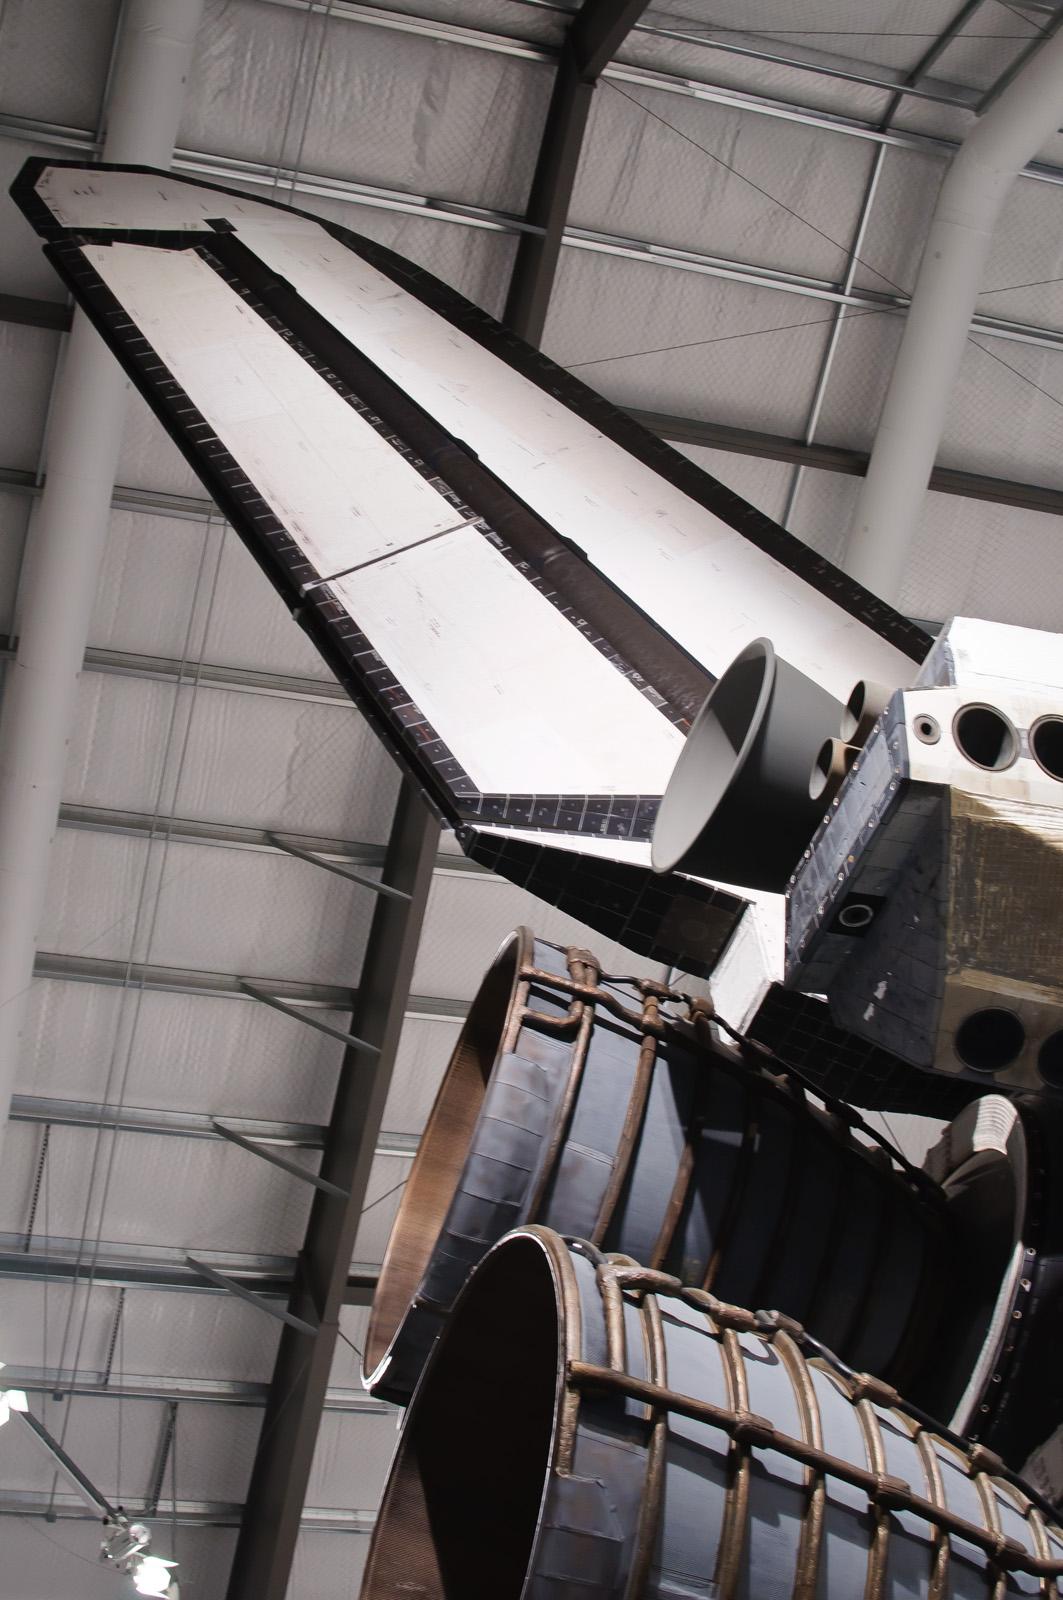 space shuttle endeavour size - photo #18